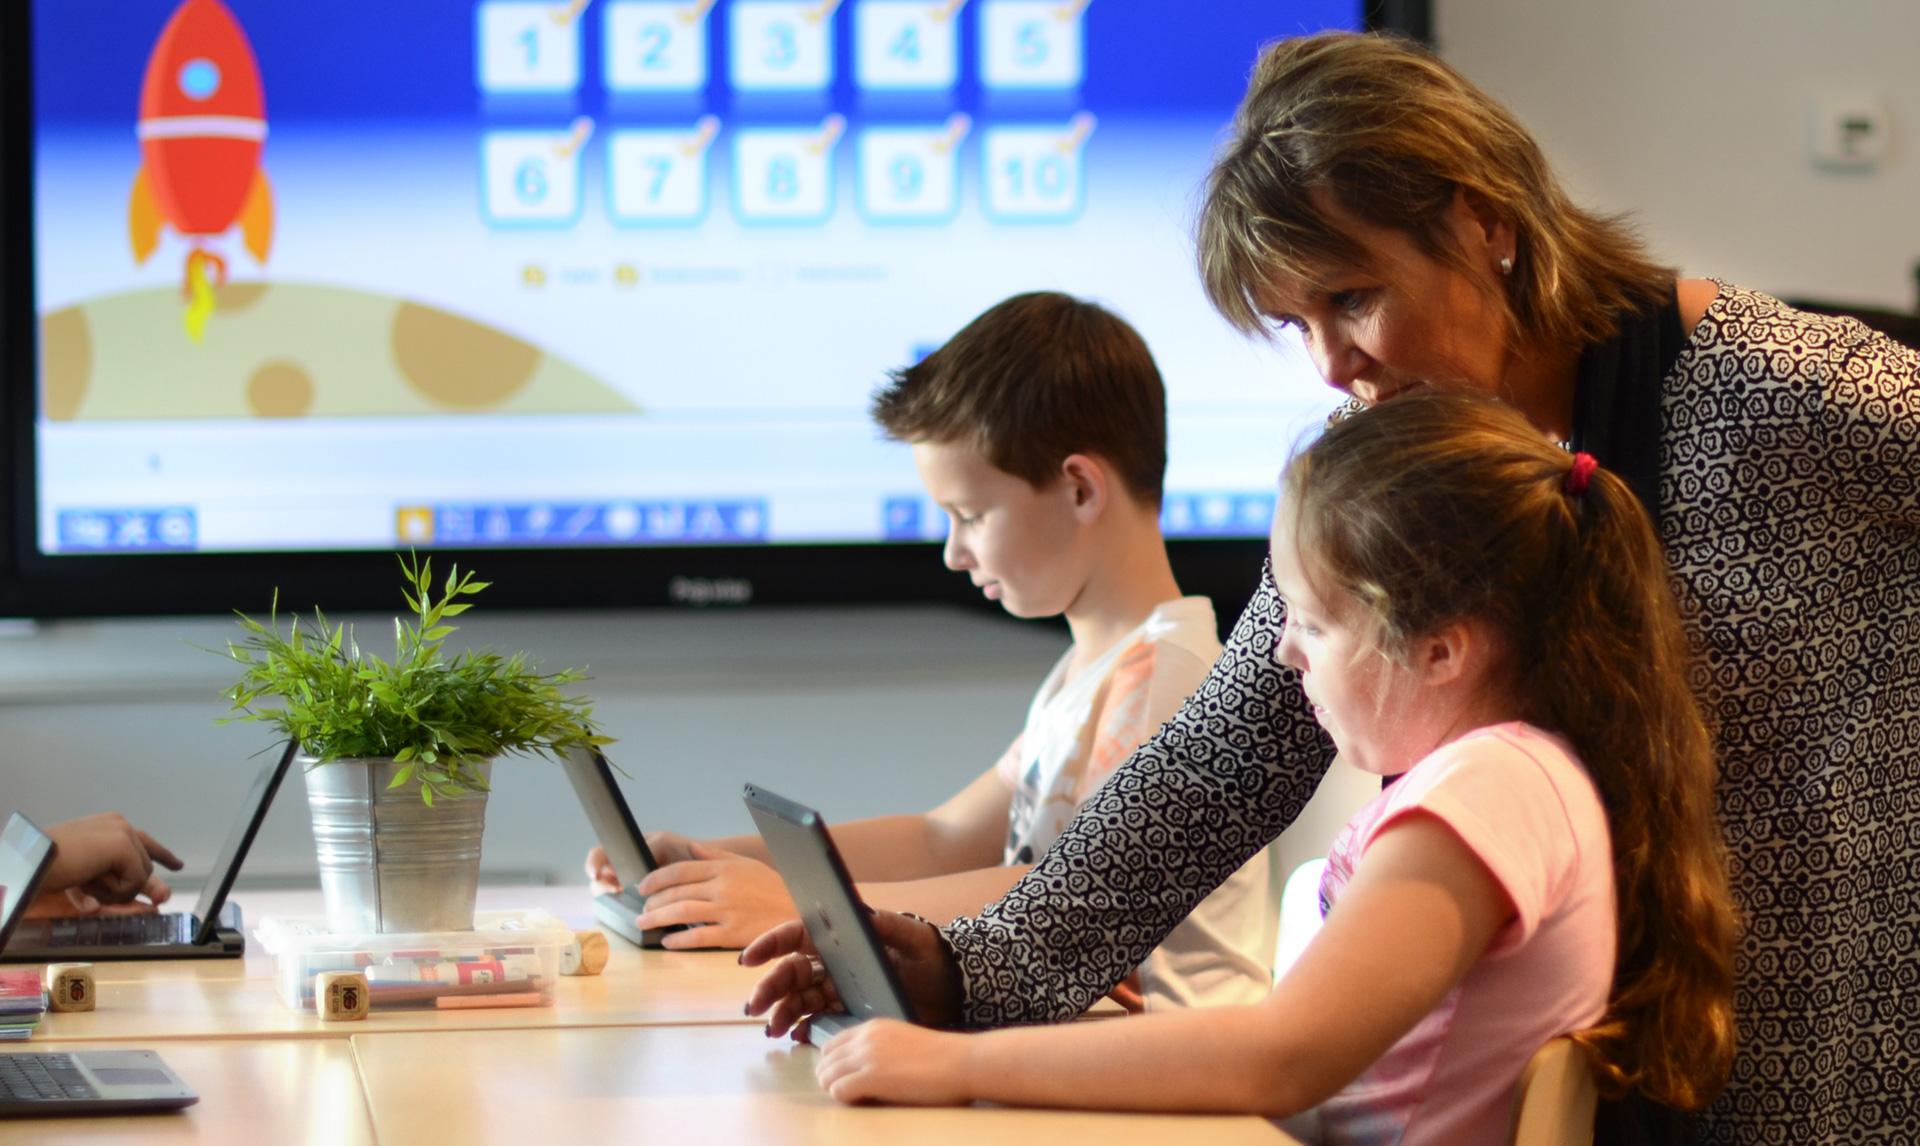 Laering-og-digitalisering-i-det-moderne-klasserommet-3